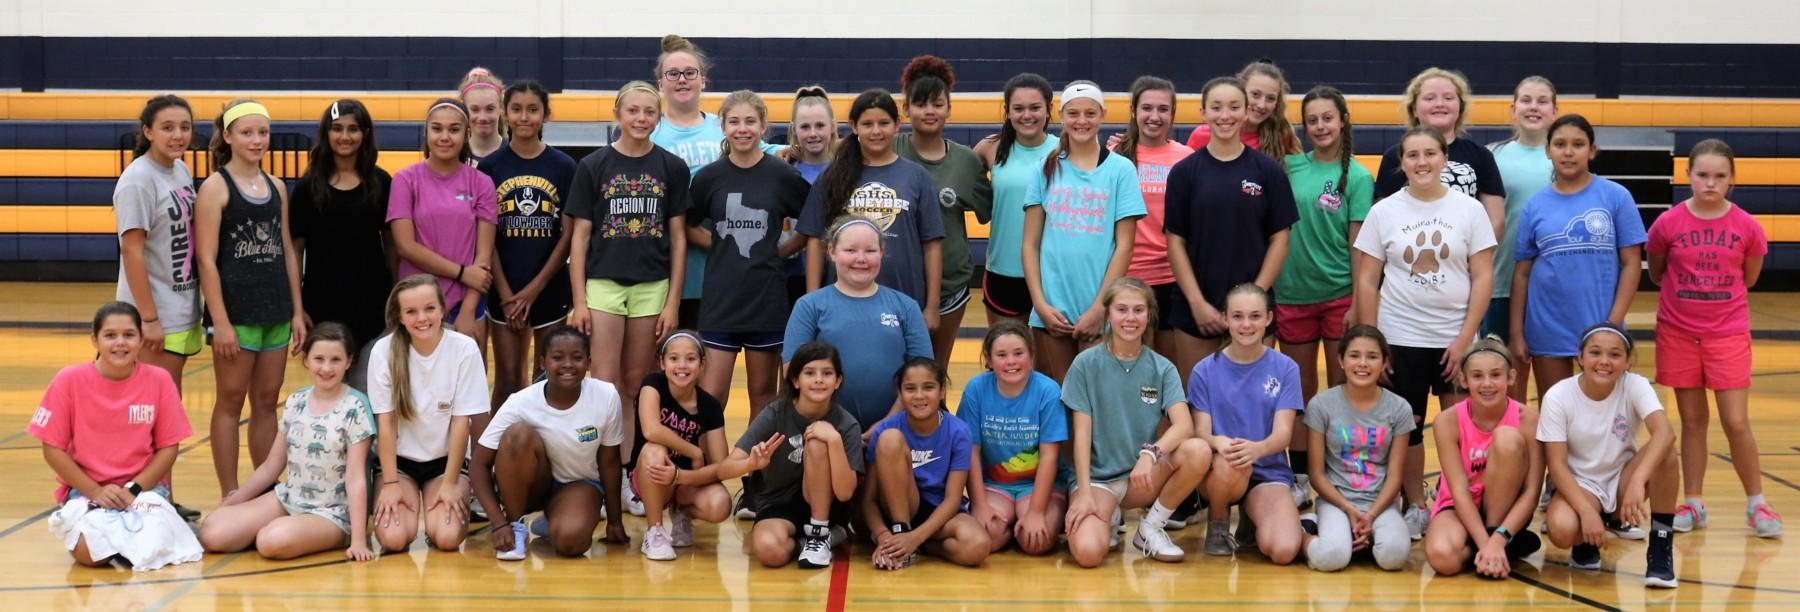 Honeybee Basketball Camp 1